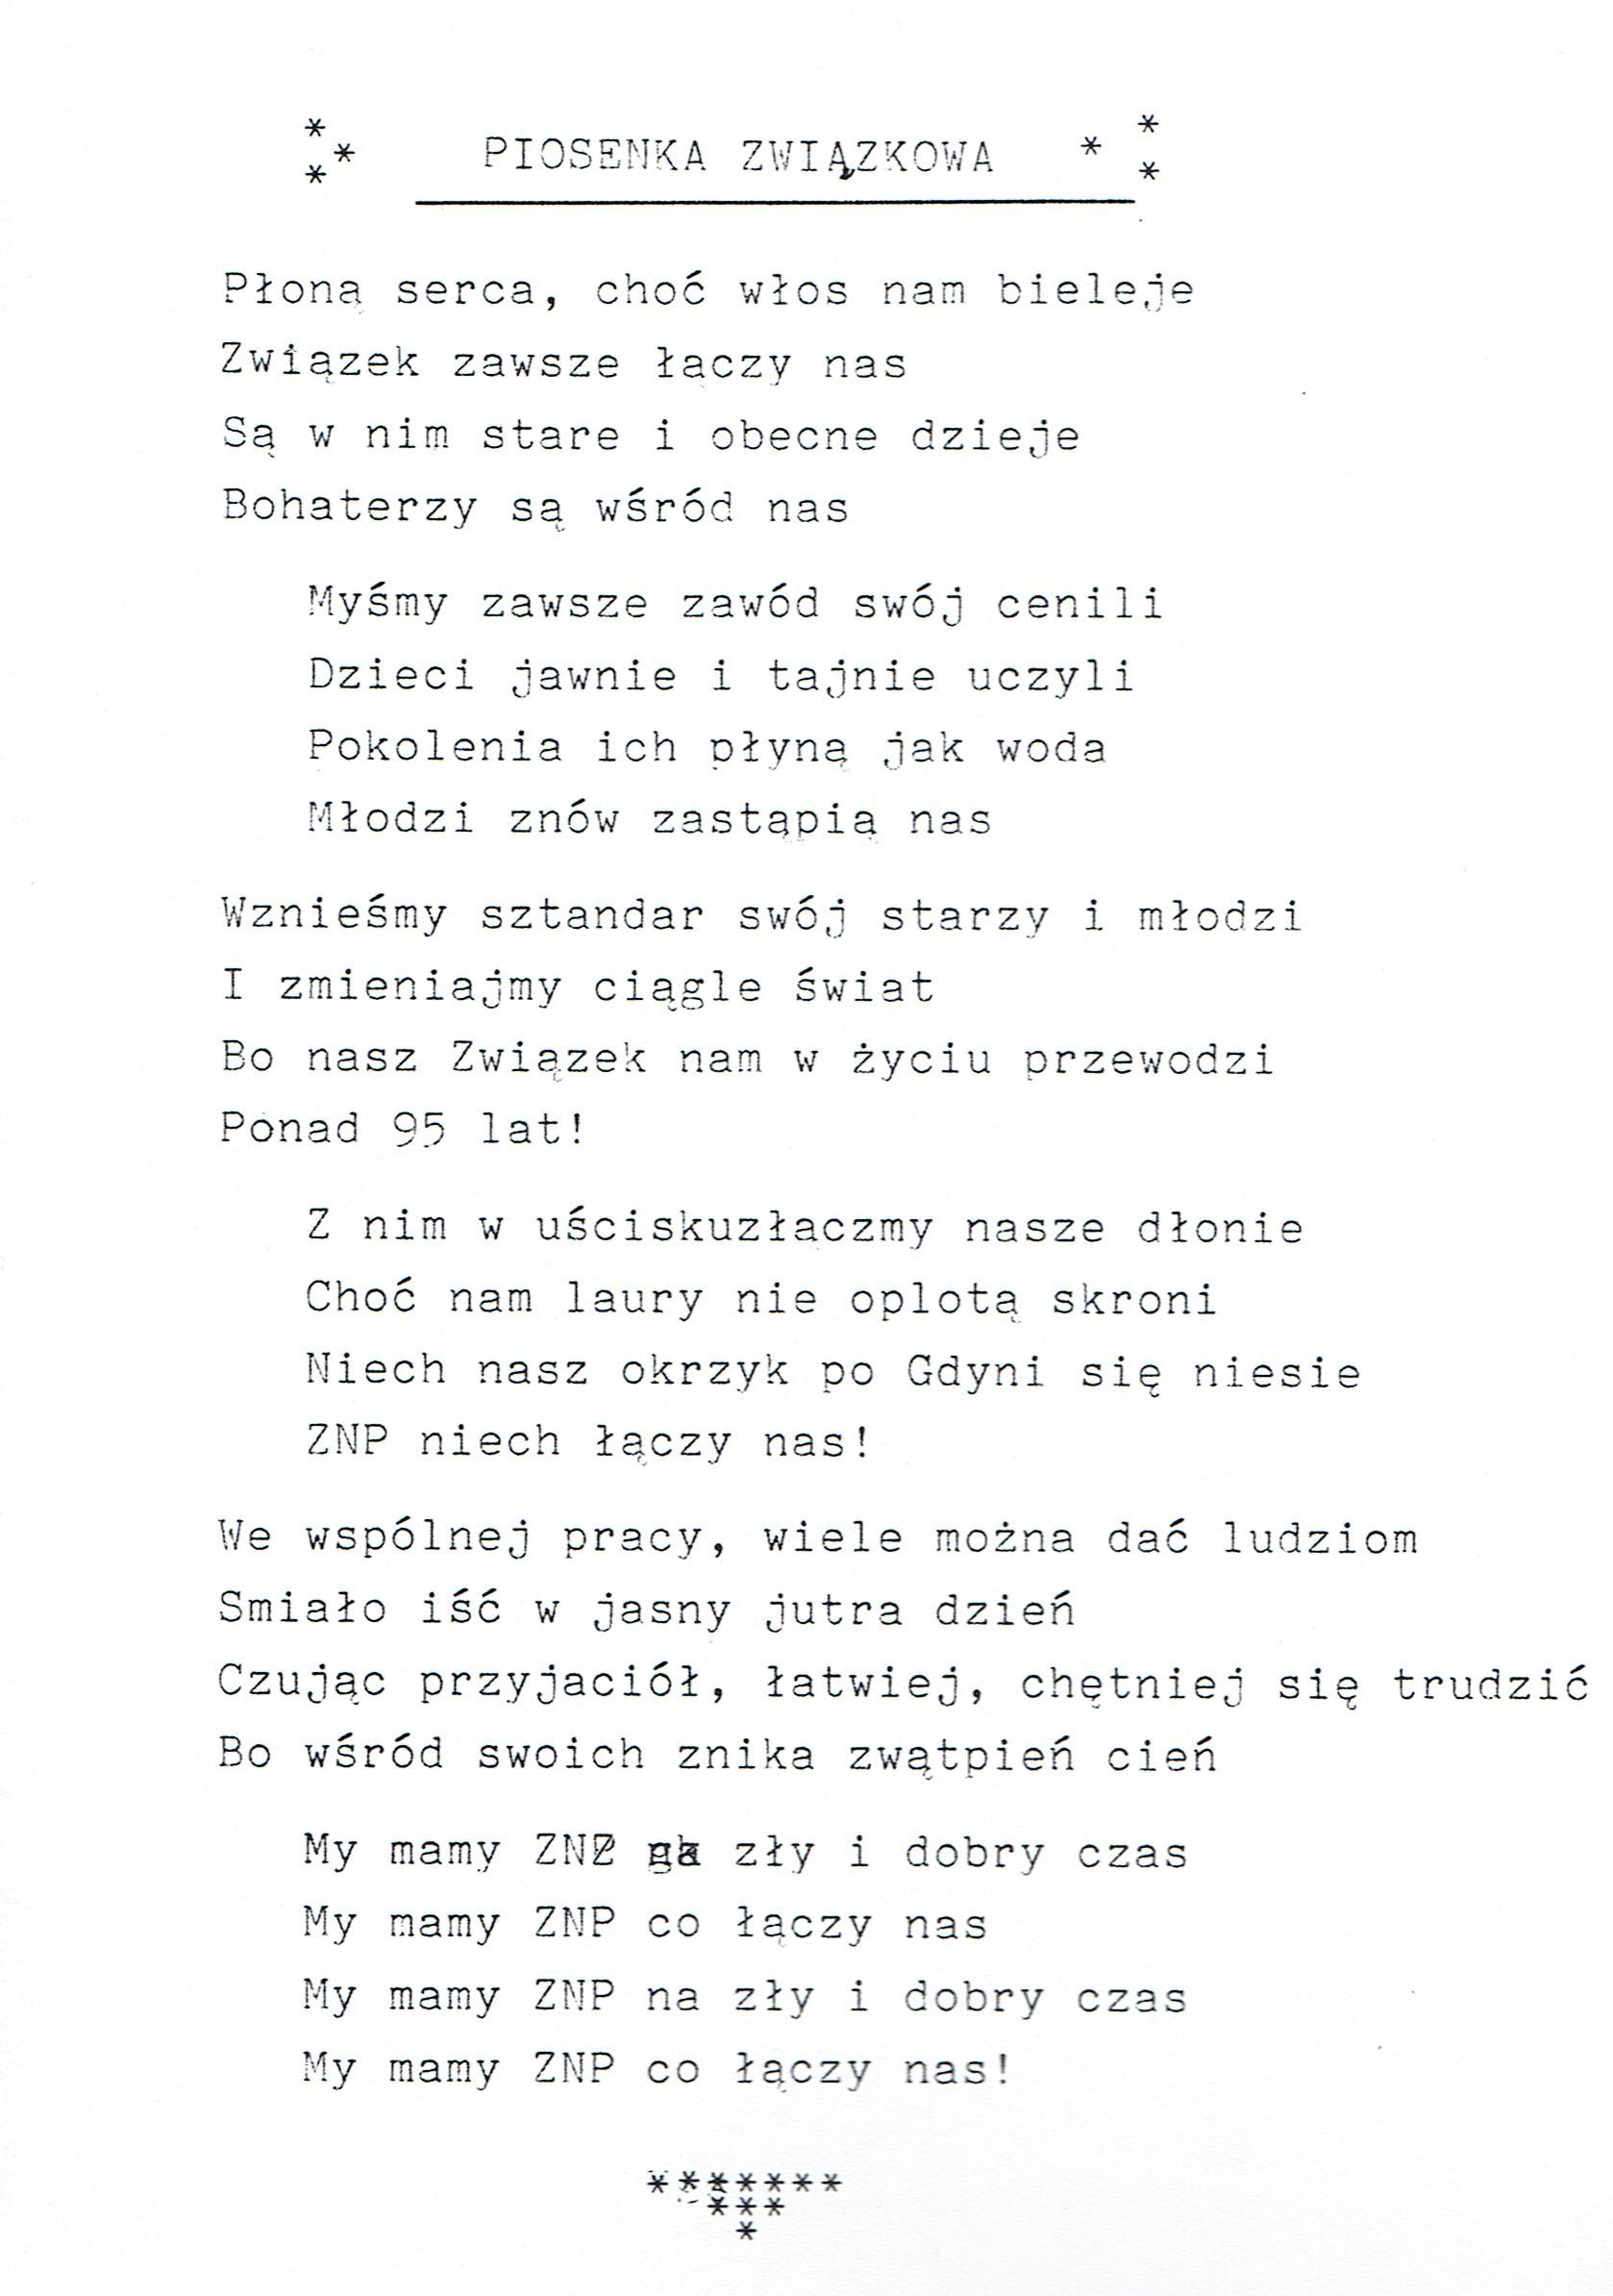 pisn_zwiazkowa_na_95_lat